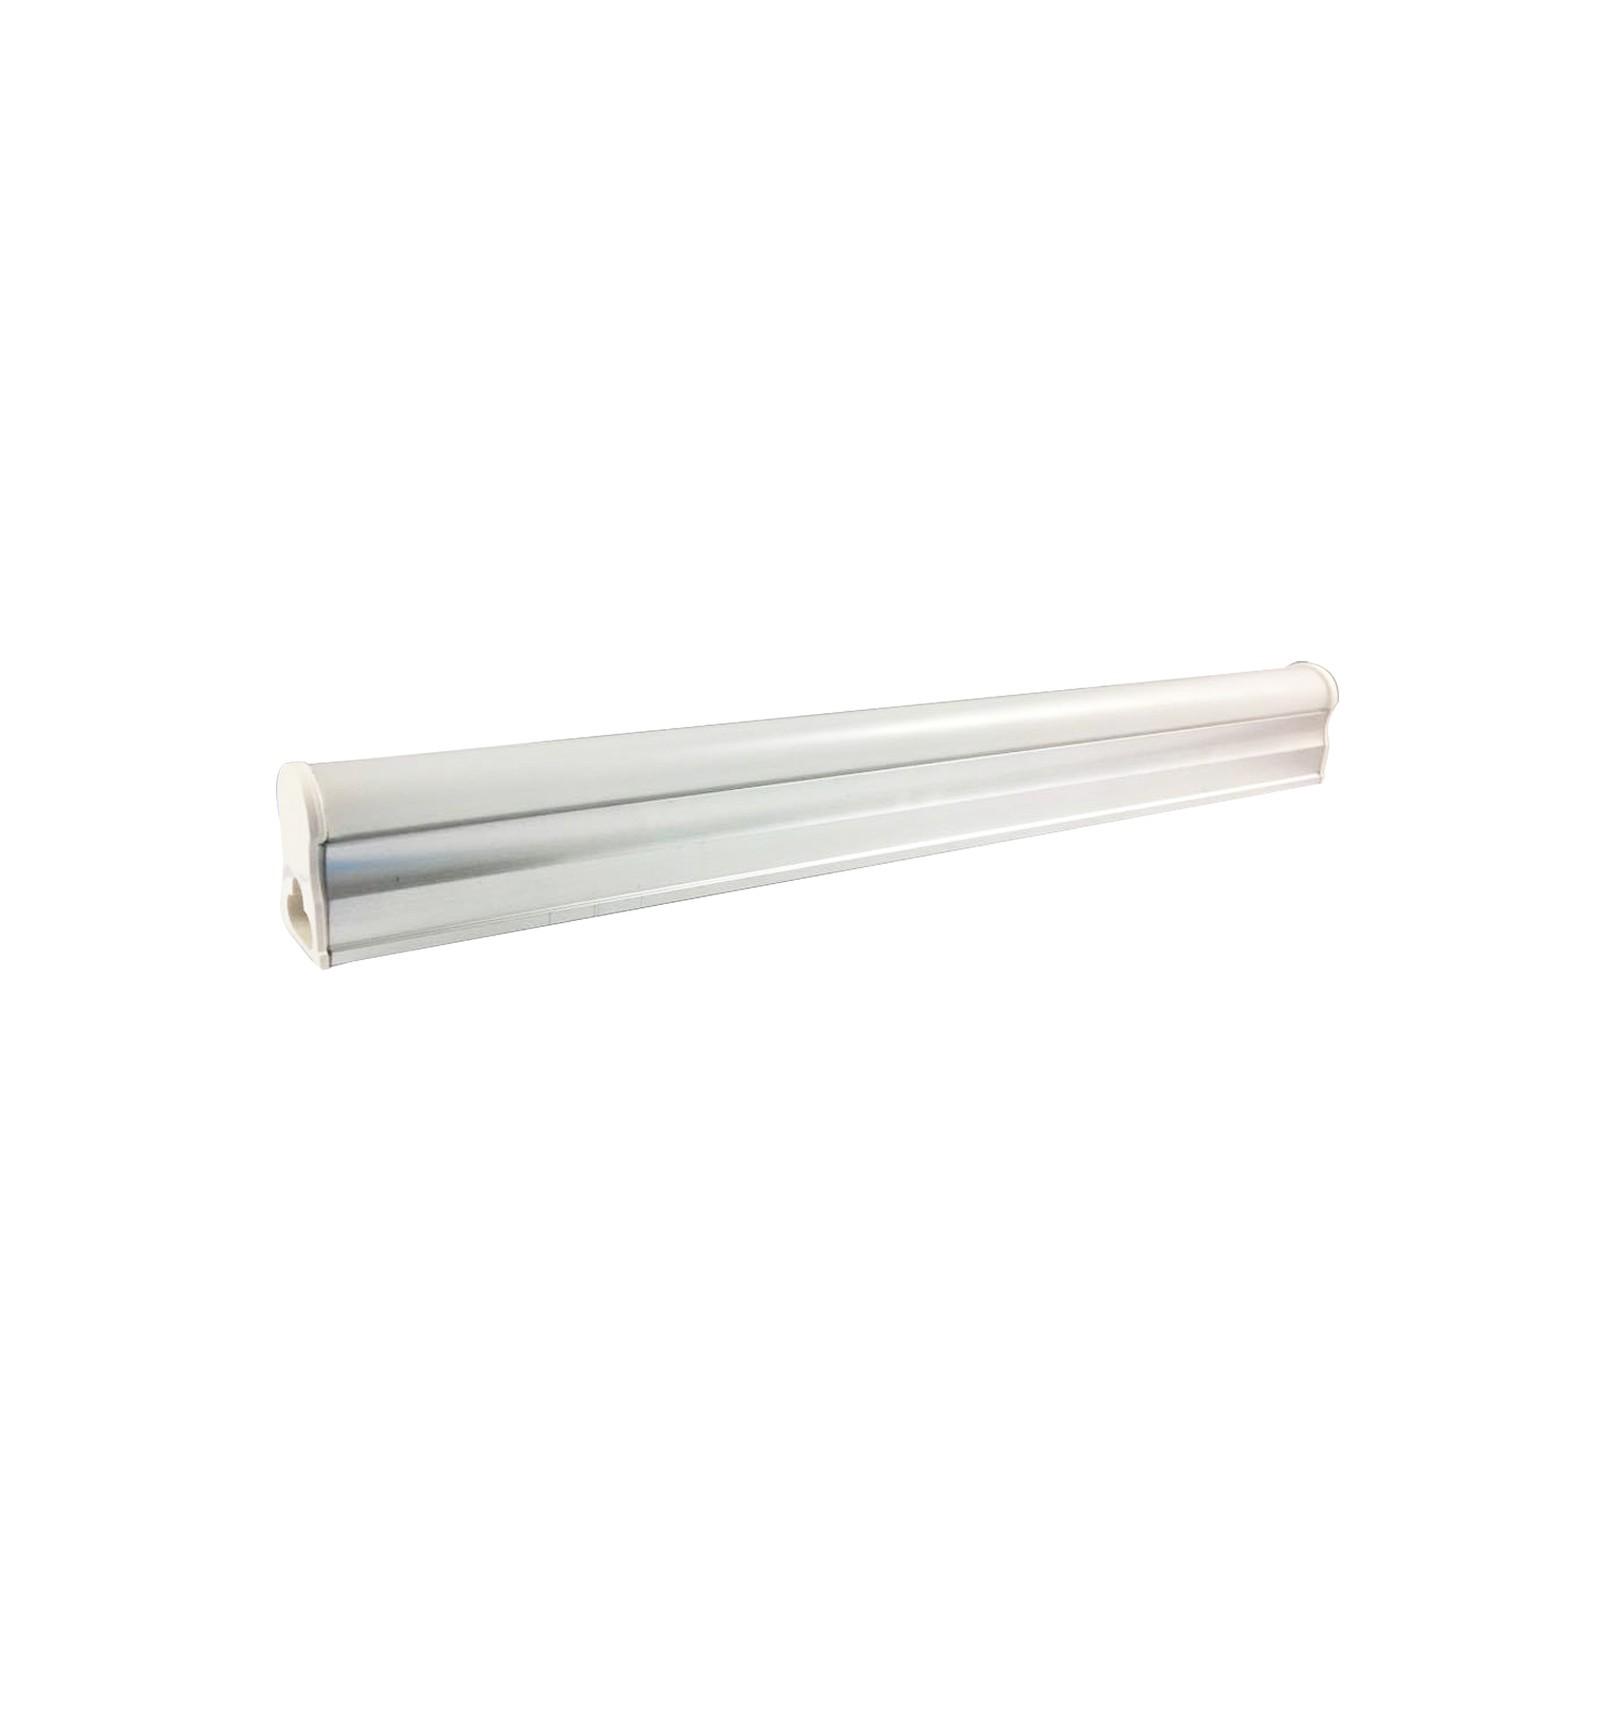 tube led t5 20w blanc froid 6000k longueur 150cm. Black Bedroom Furniture Sets. Home Design Ideas